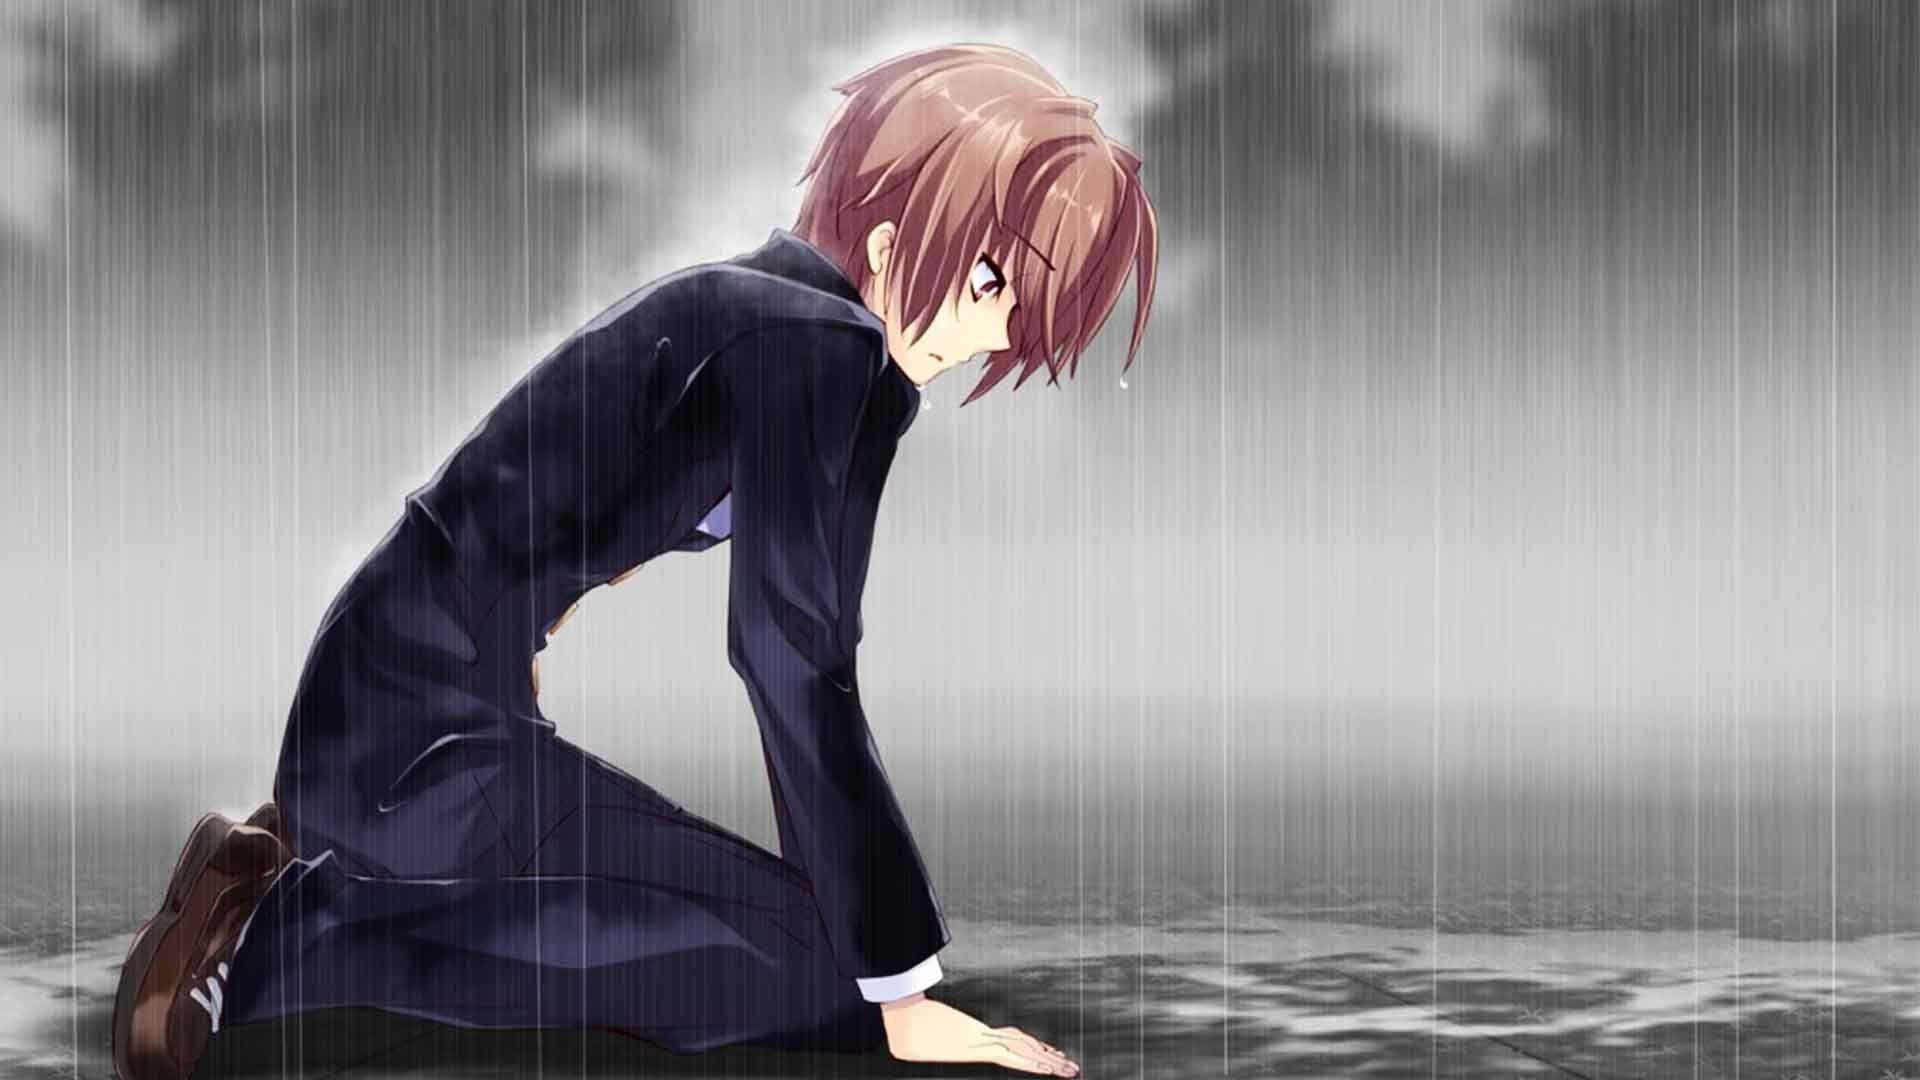 Sad Anime Boy Wallpapers Top Free Sad Anime Boy Backgrounds Wallpaperaccess